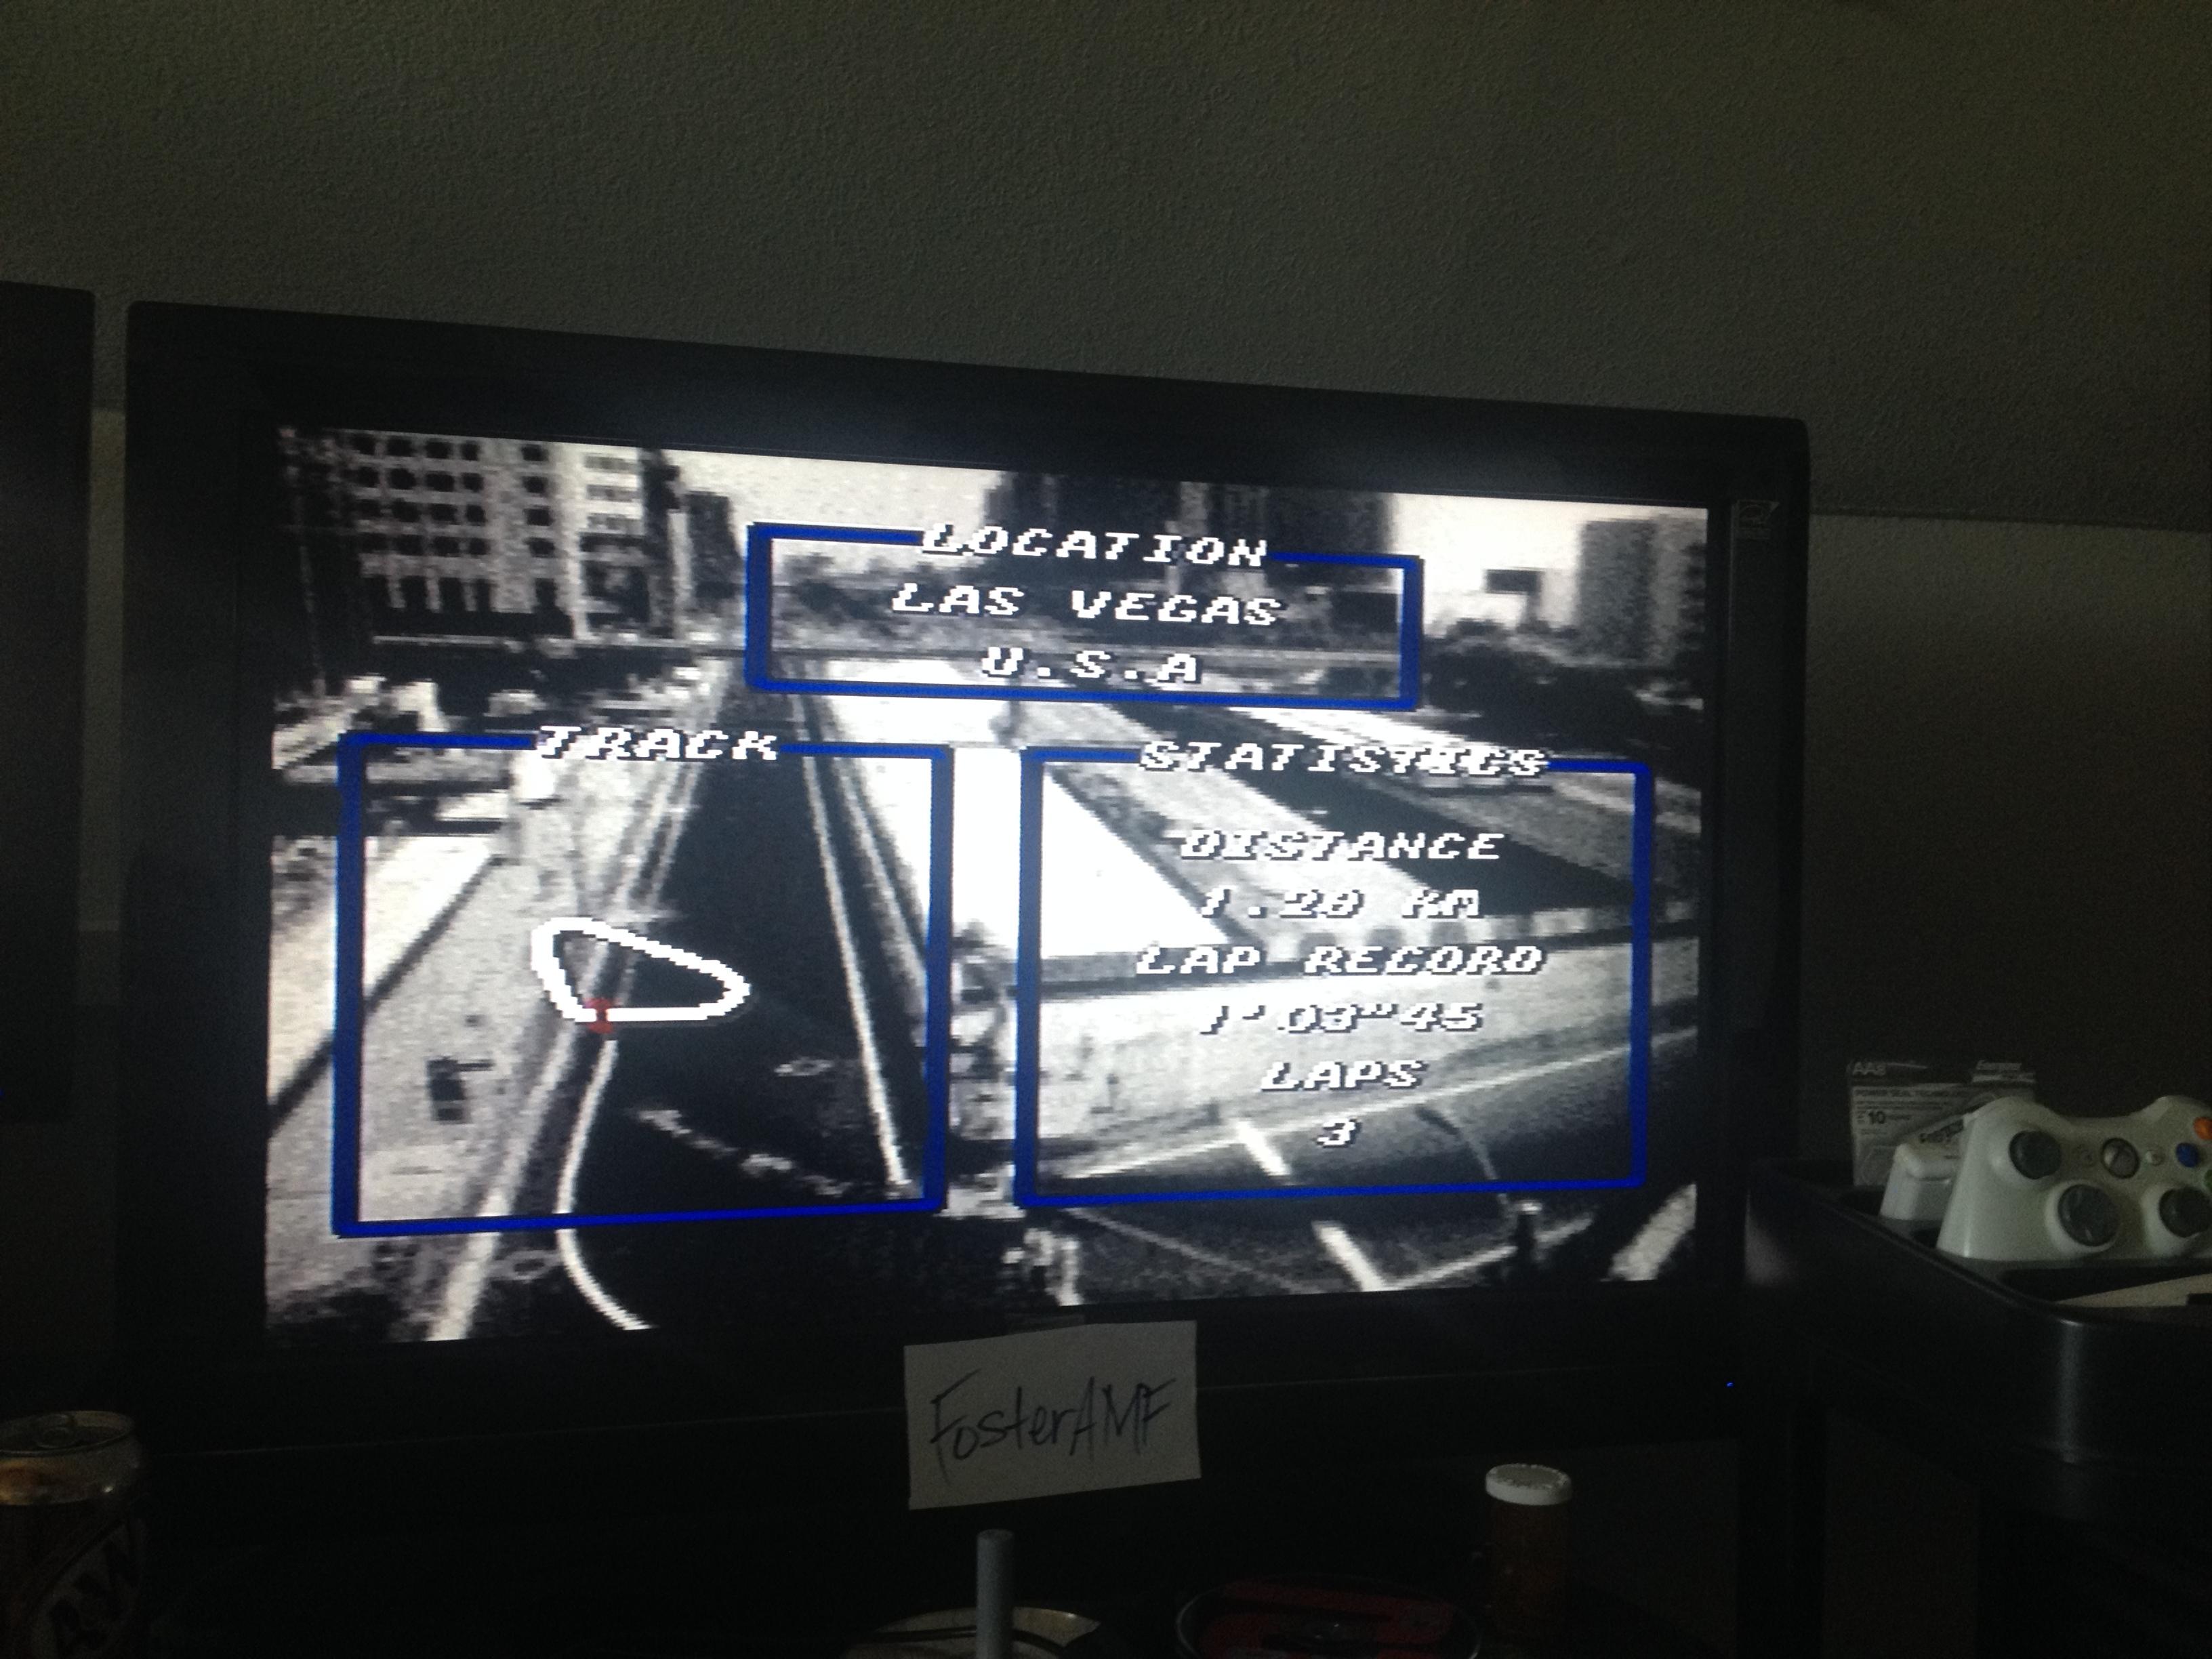 FosterAMF: Top Gear [Track 1: Las Vegas/Amateur Difficulty/No Nitro] (SNES/Super Famicom) 0:01:06.53 points on 2014-07-15 00:24:12